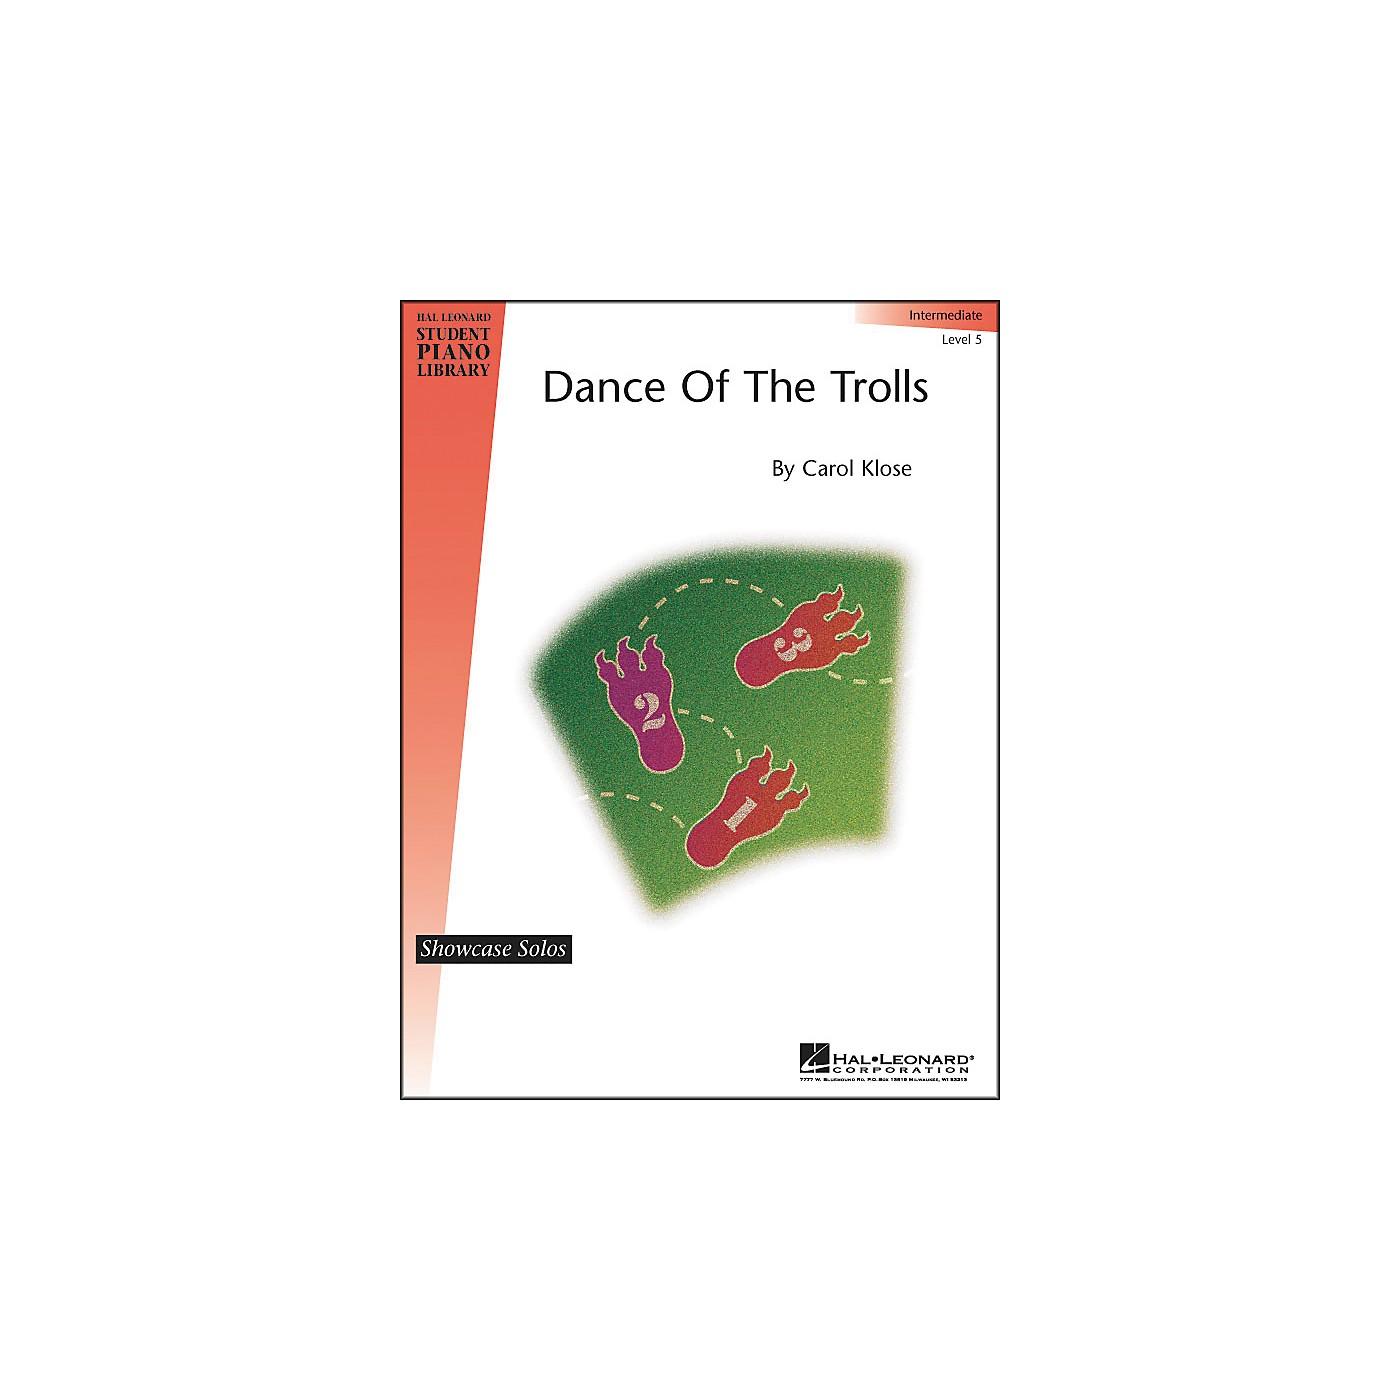 Hal Leonard Dance Of The Trolls Intermediate Level 5 Showcase Solos Hal Leonard Student Piano Library thumbnail